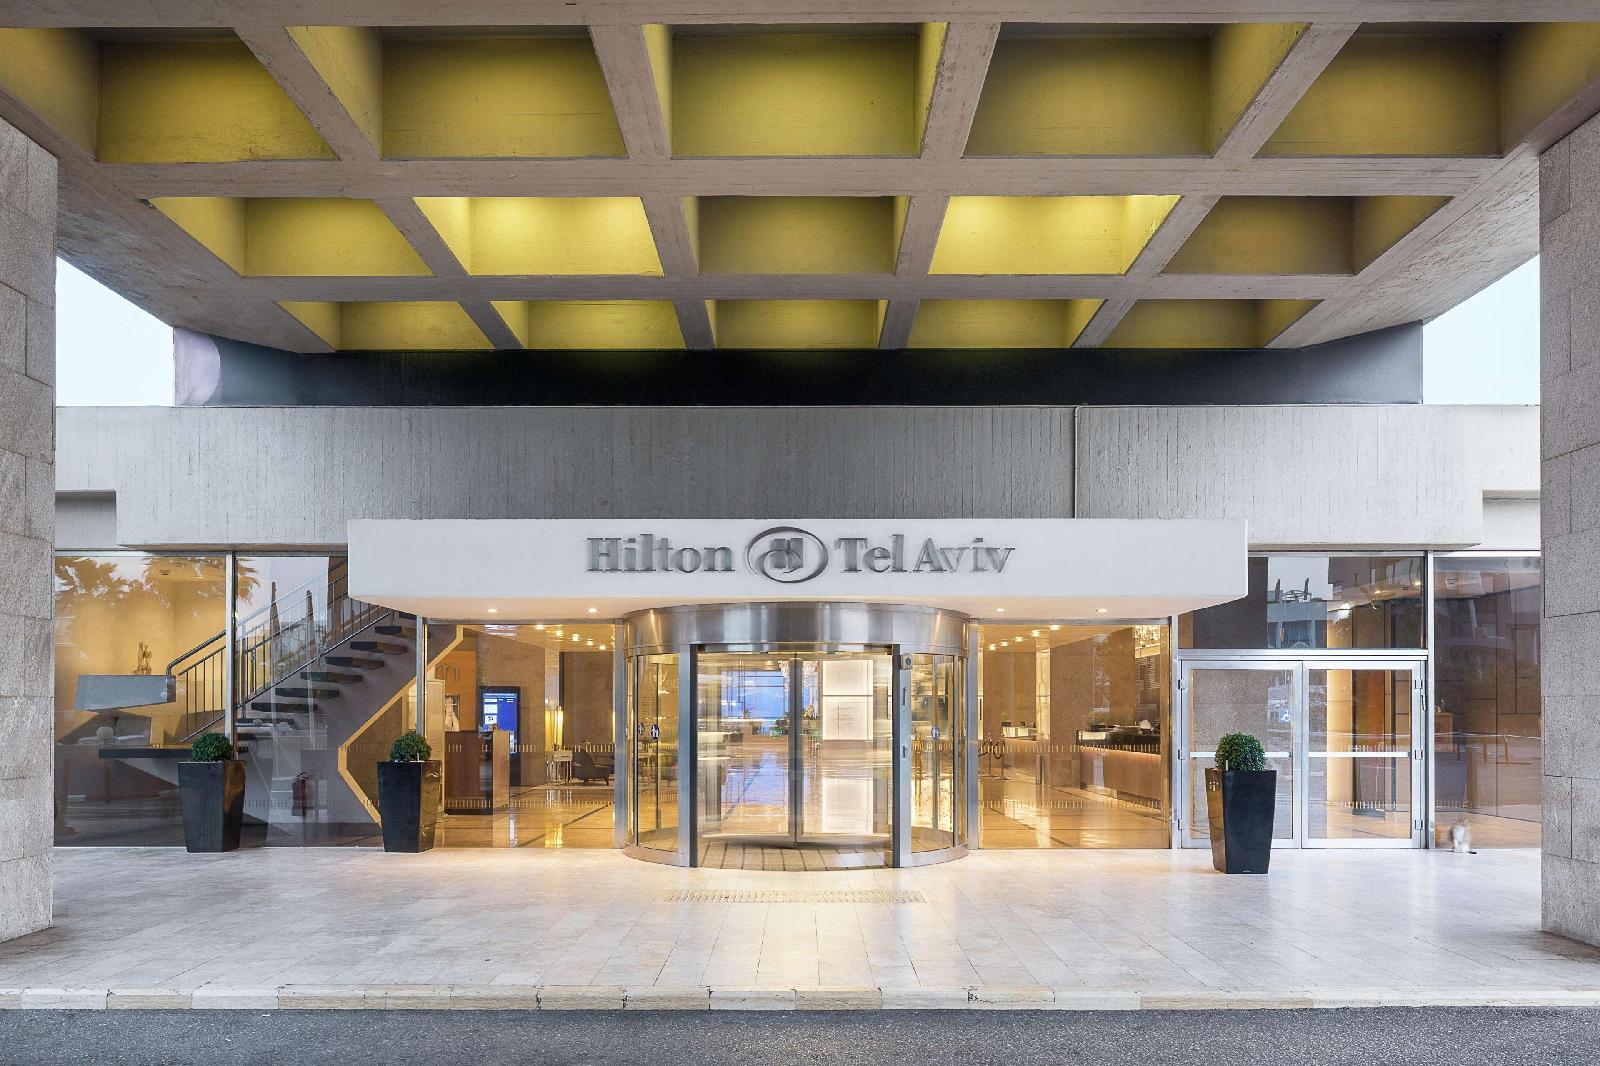 The Vista At Hilton Tel Aviv Image 13